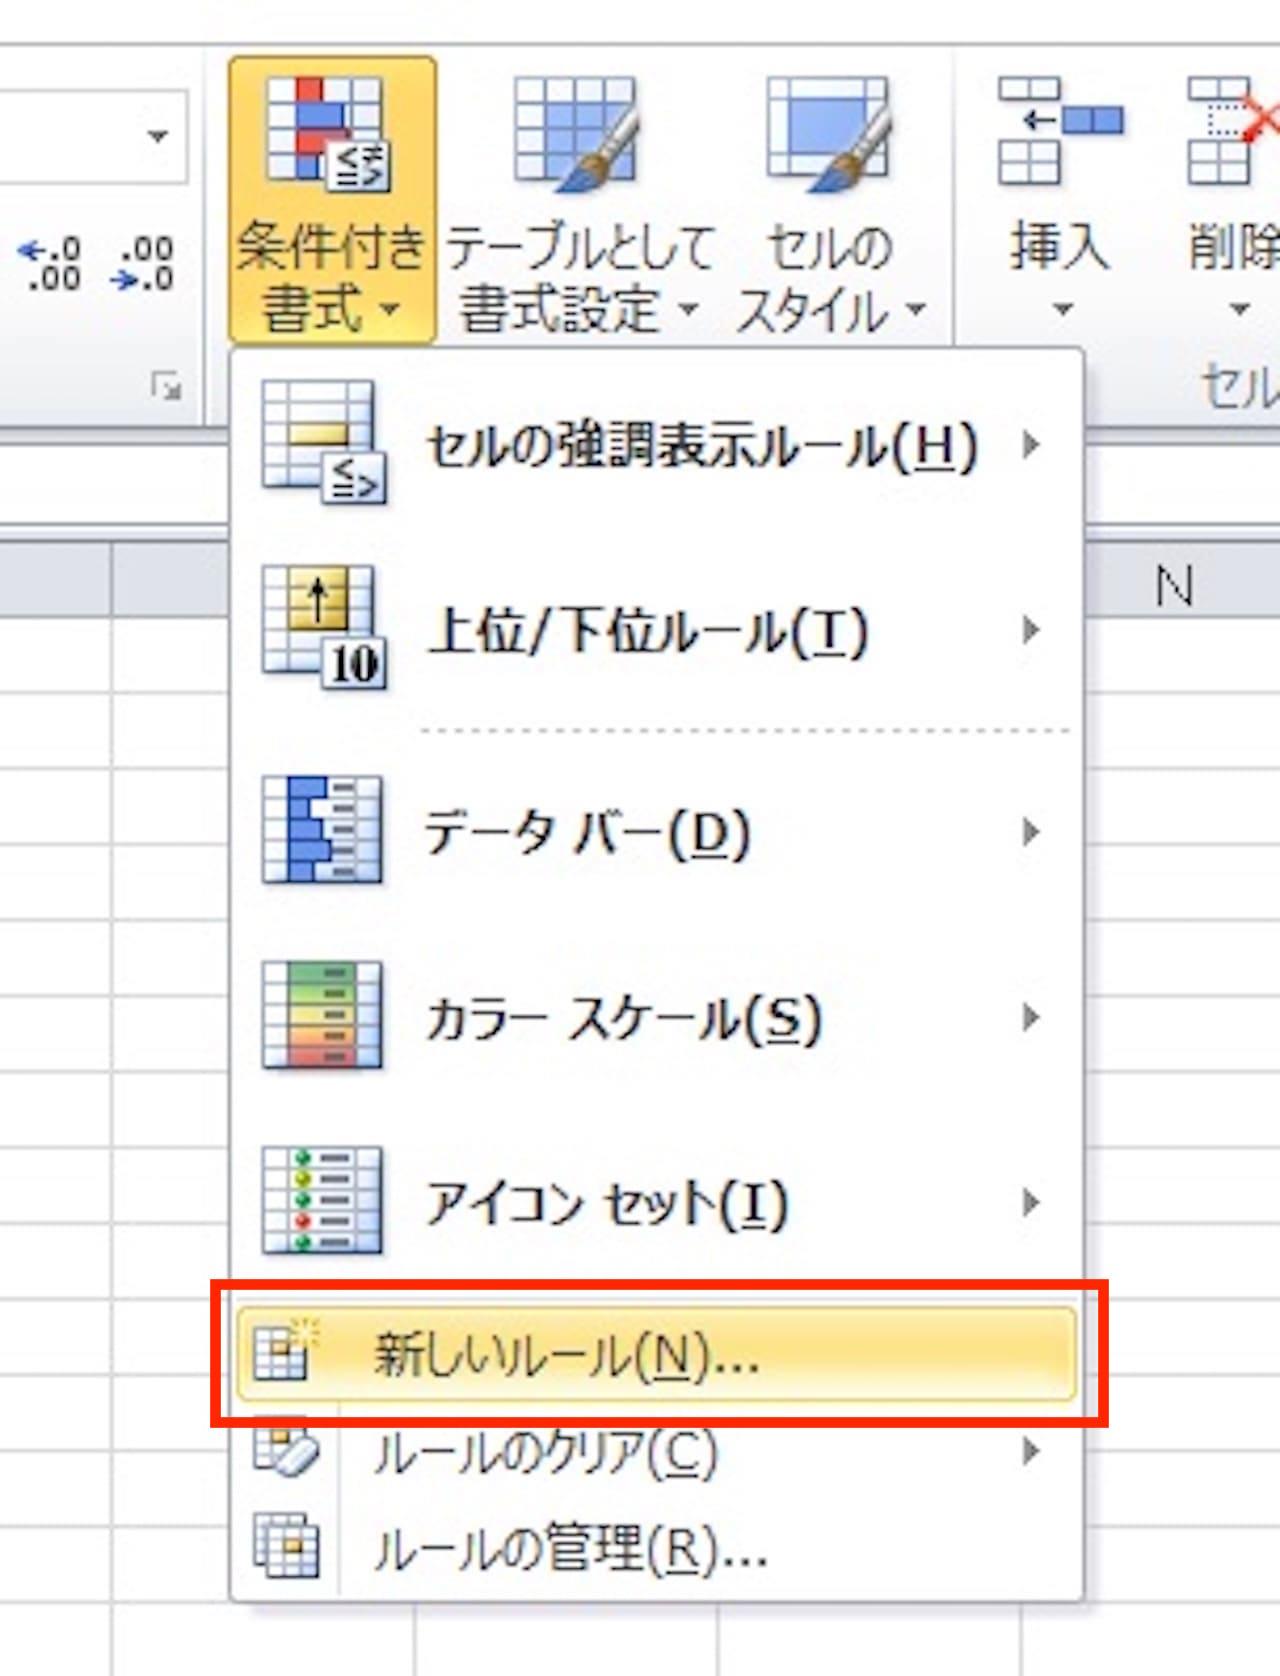 Excelで条件を満たす文字に色付けする方法⑭